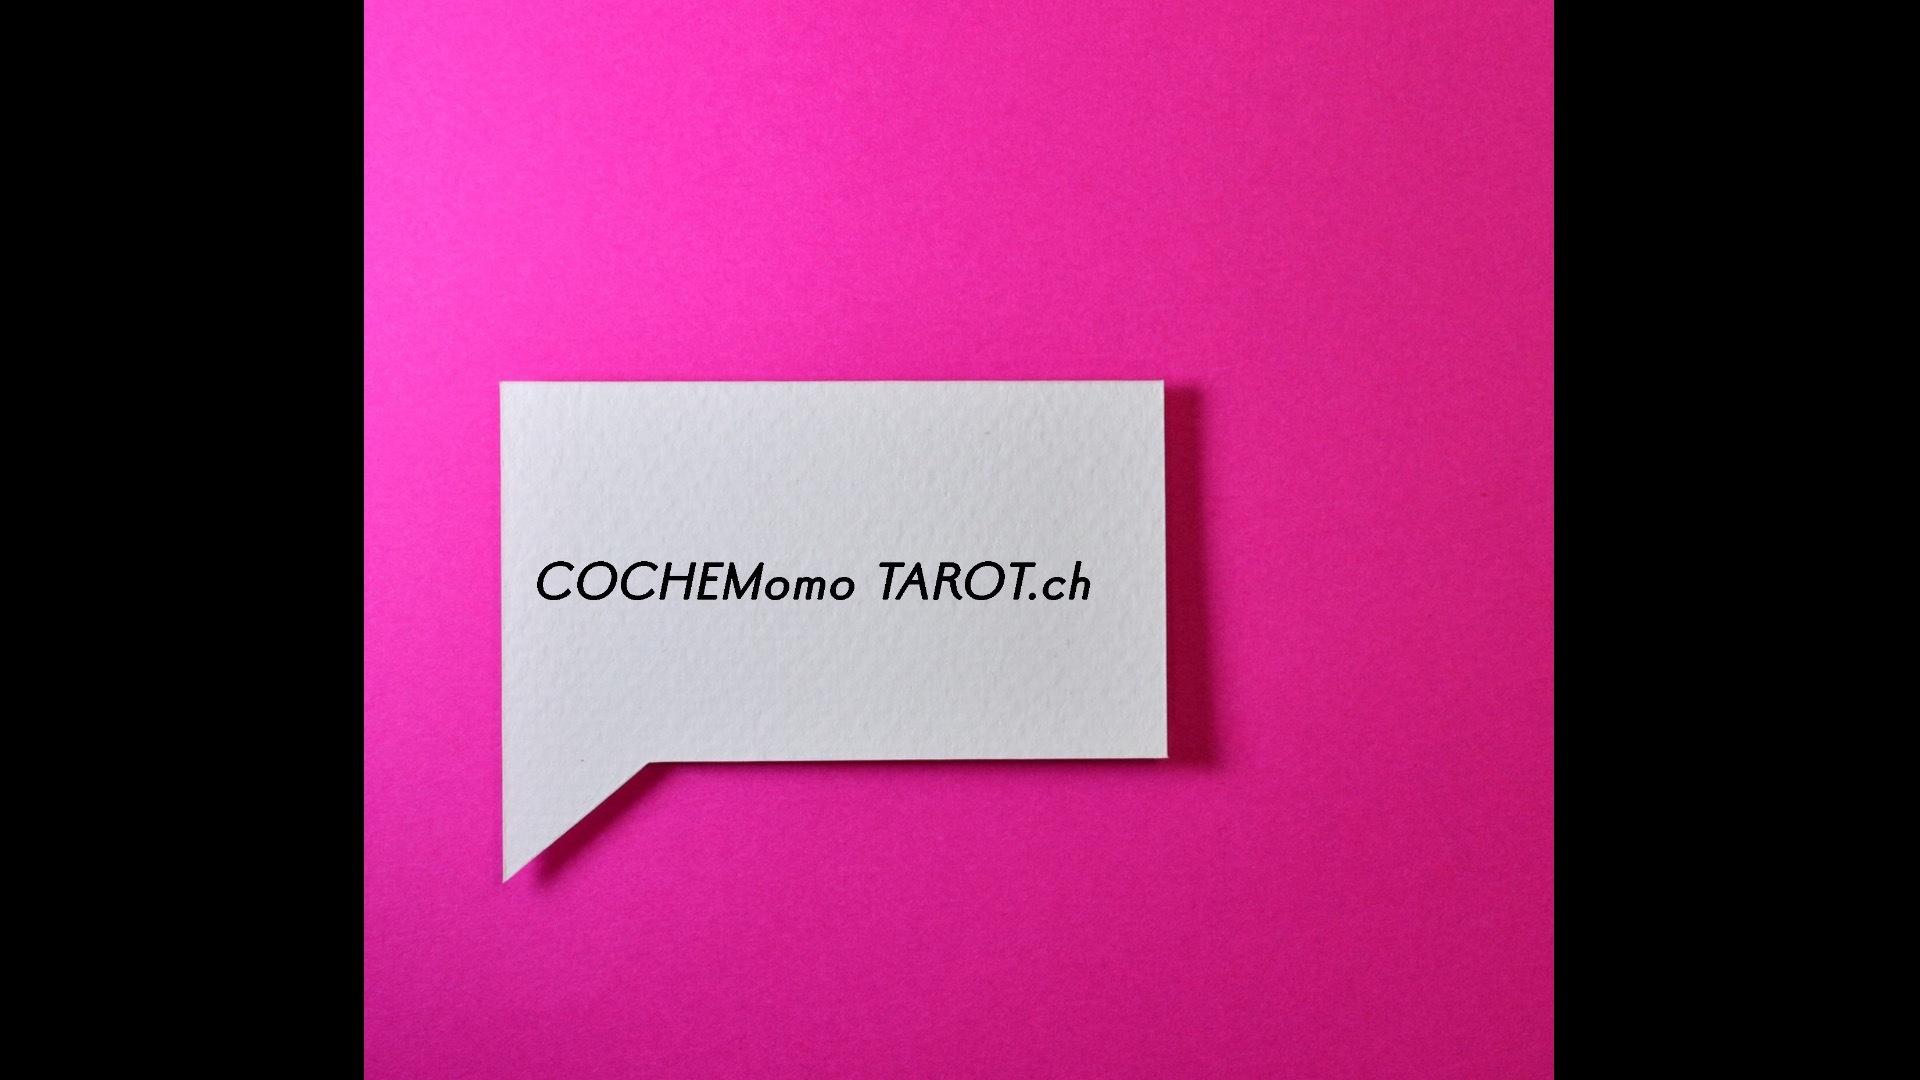 COCHEMomo TAROT(コケモモ)